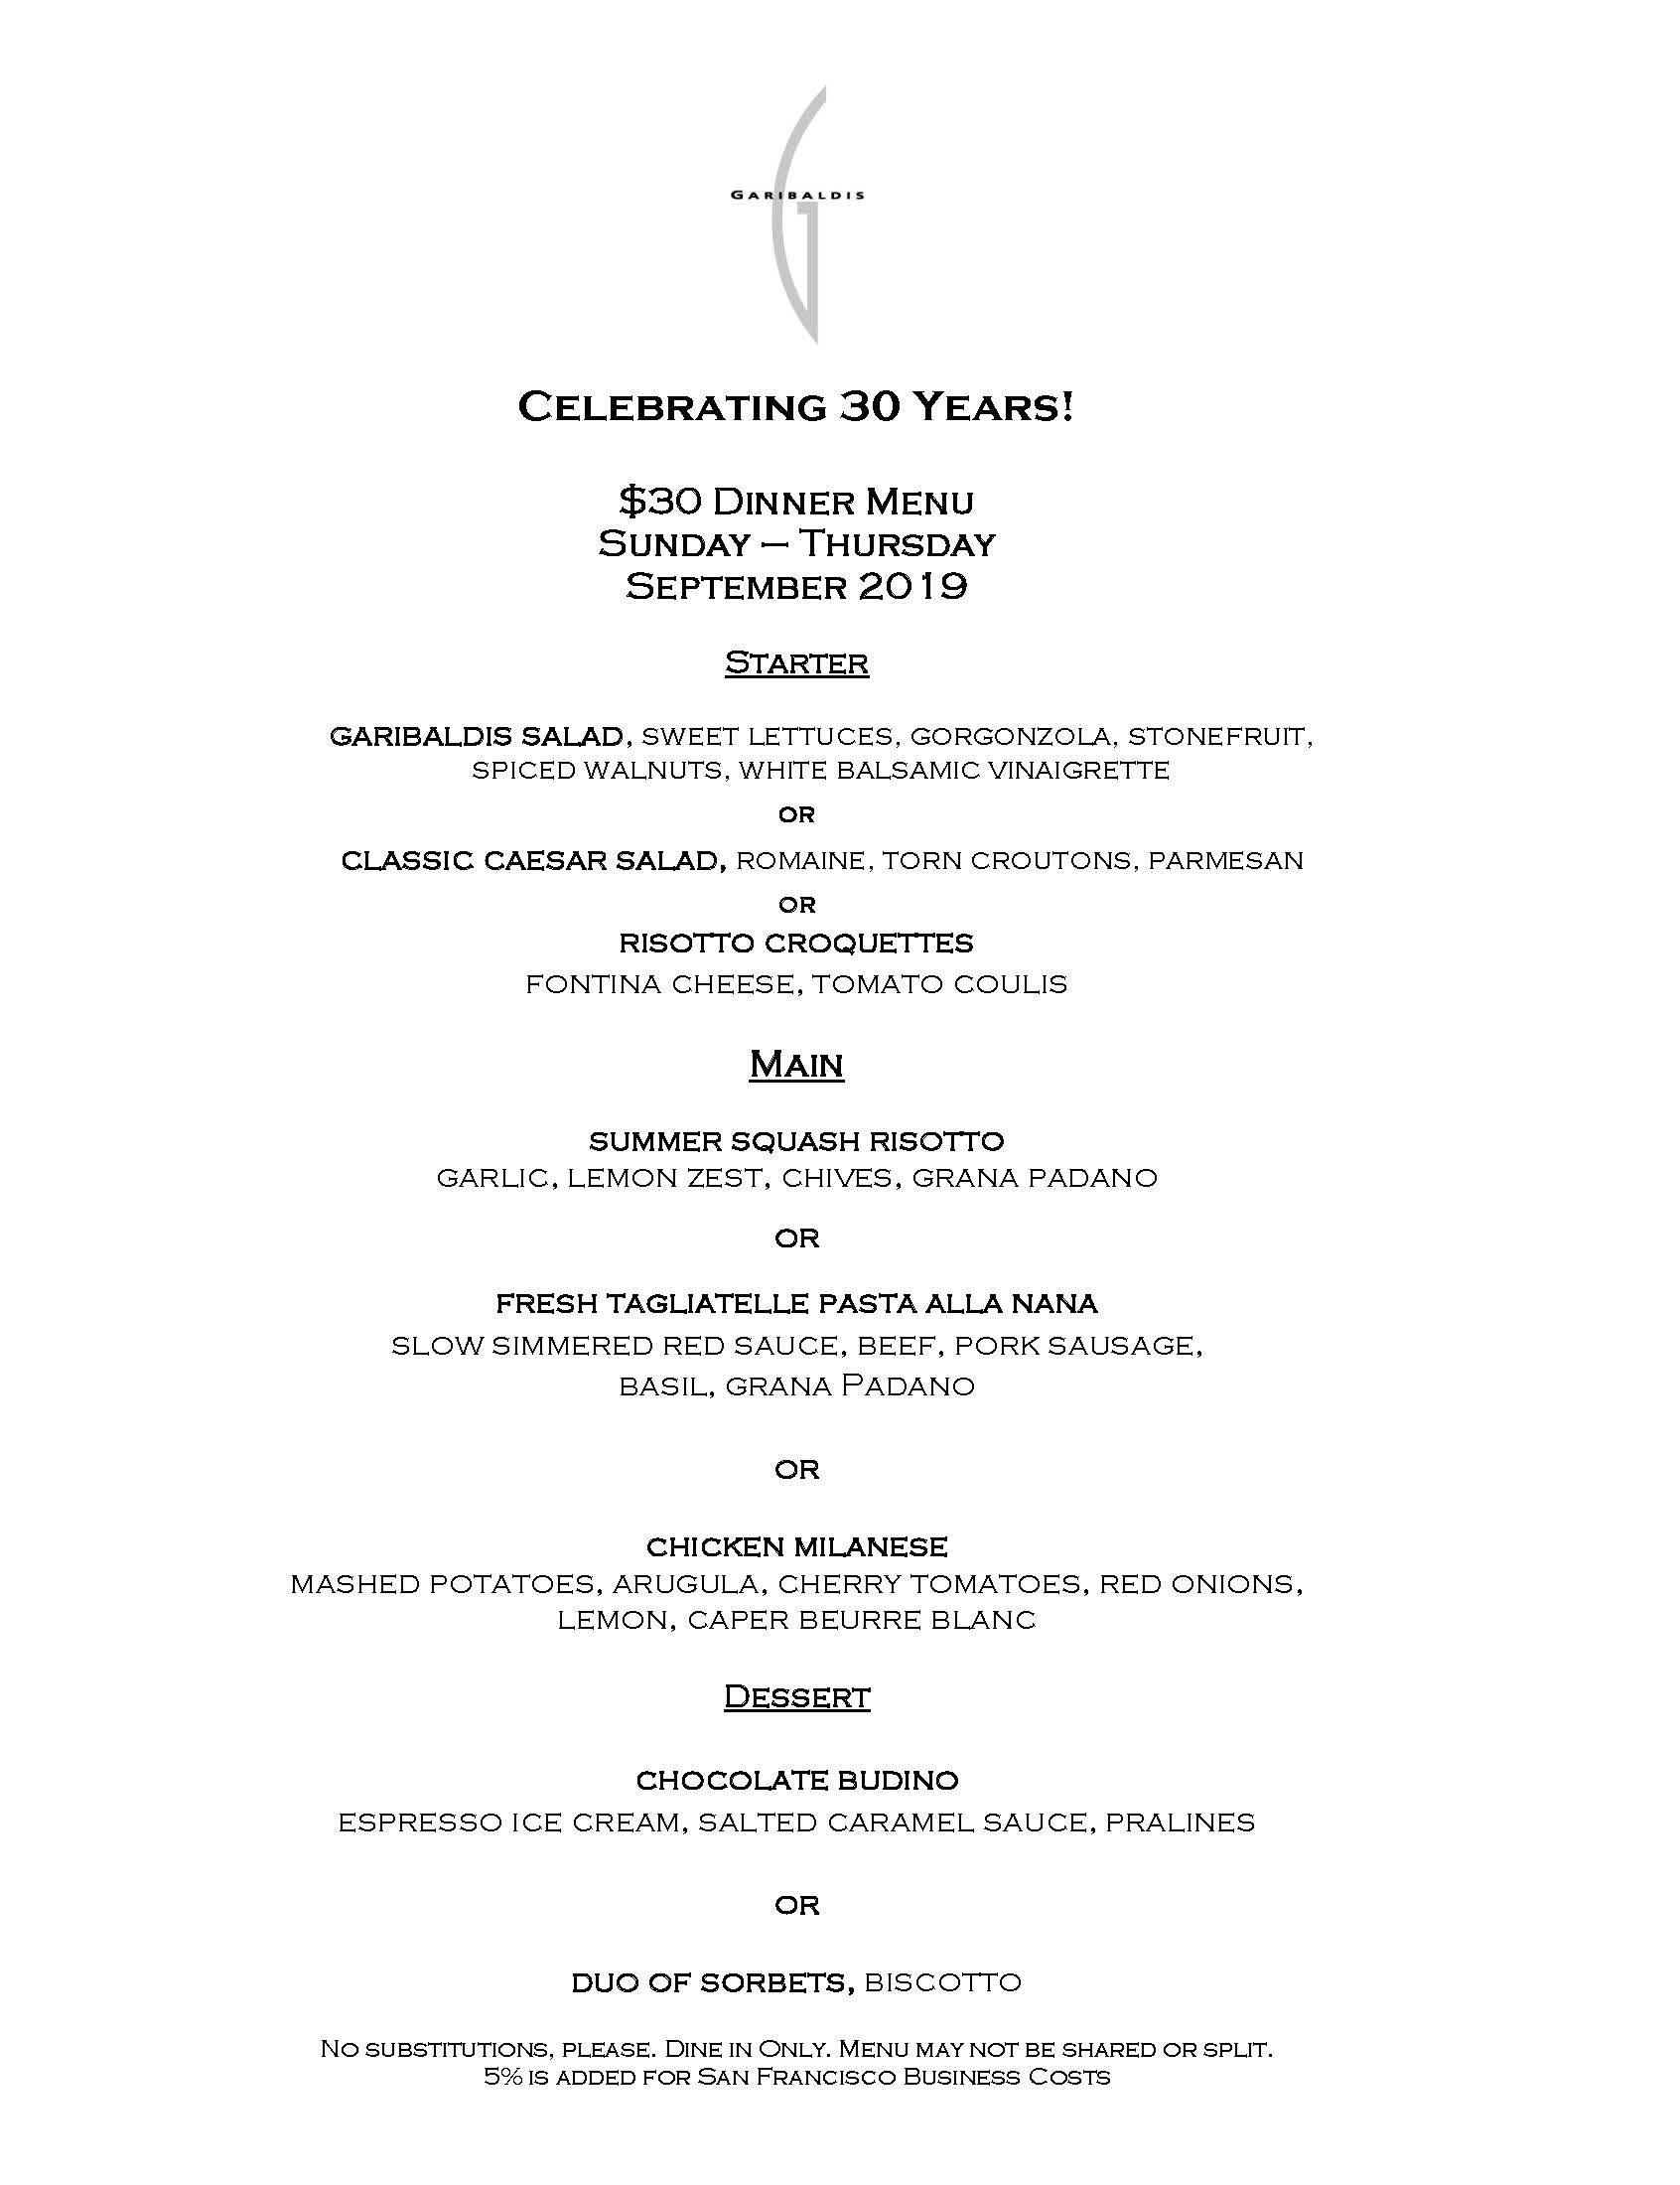 30 year menu 2019.jpg